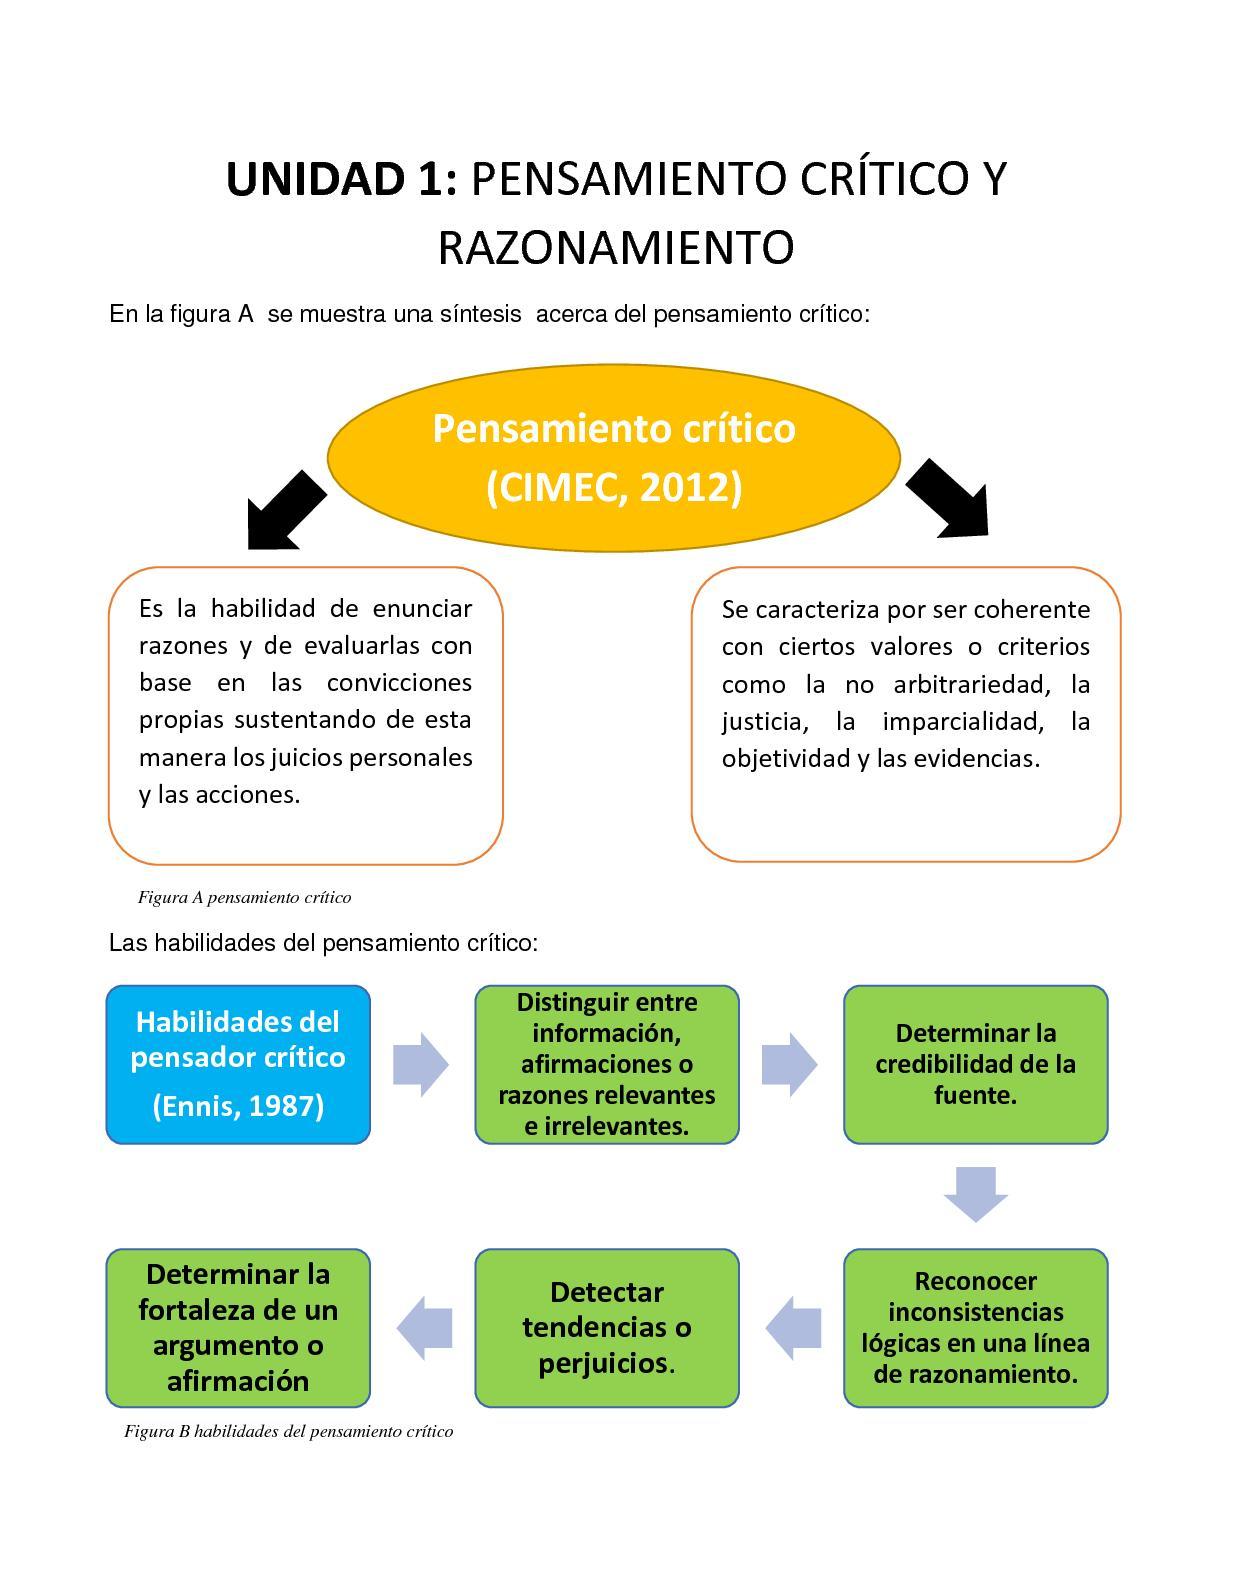 Vistoso Hoja De Destrezas De Pensamiento CrÃtico AnalogÃas Imagen ...